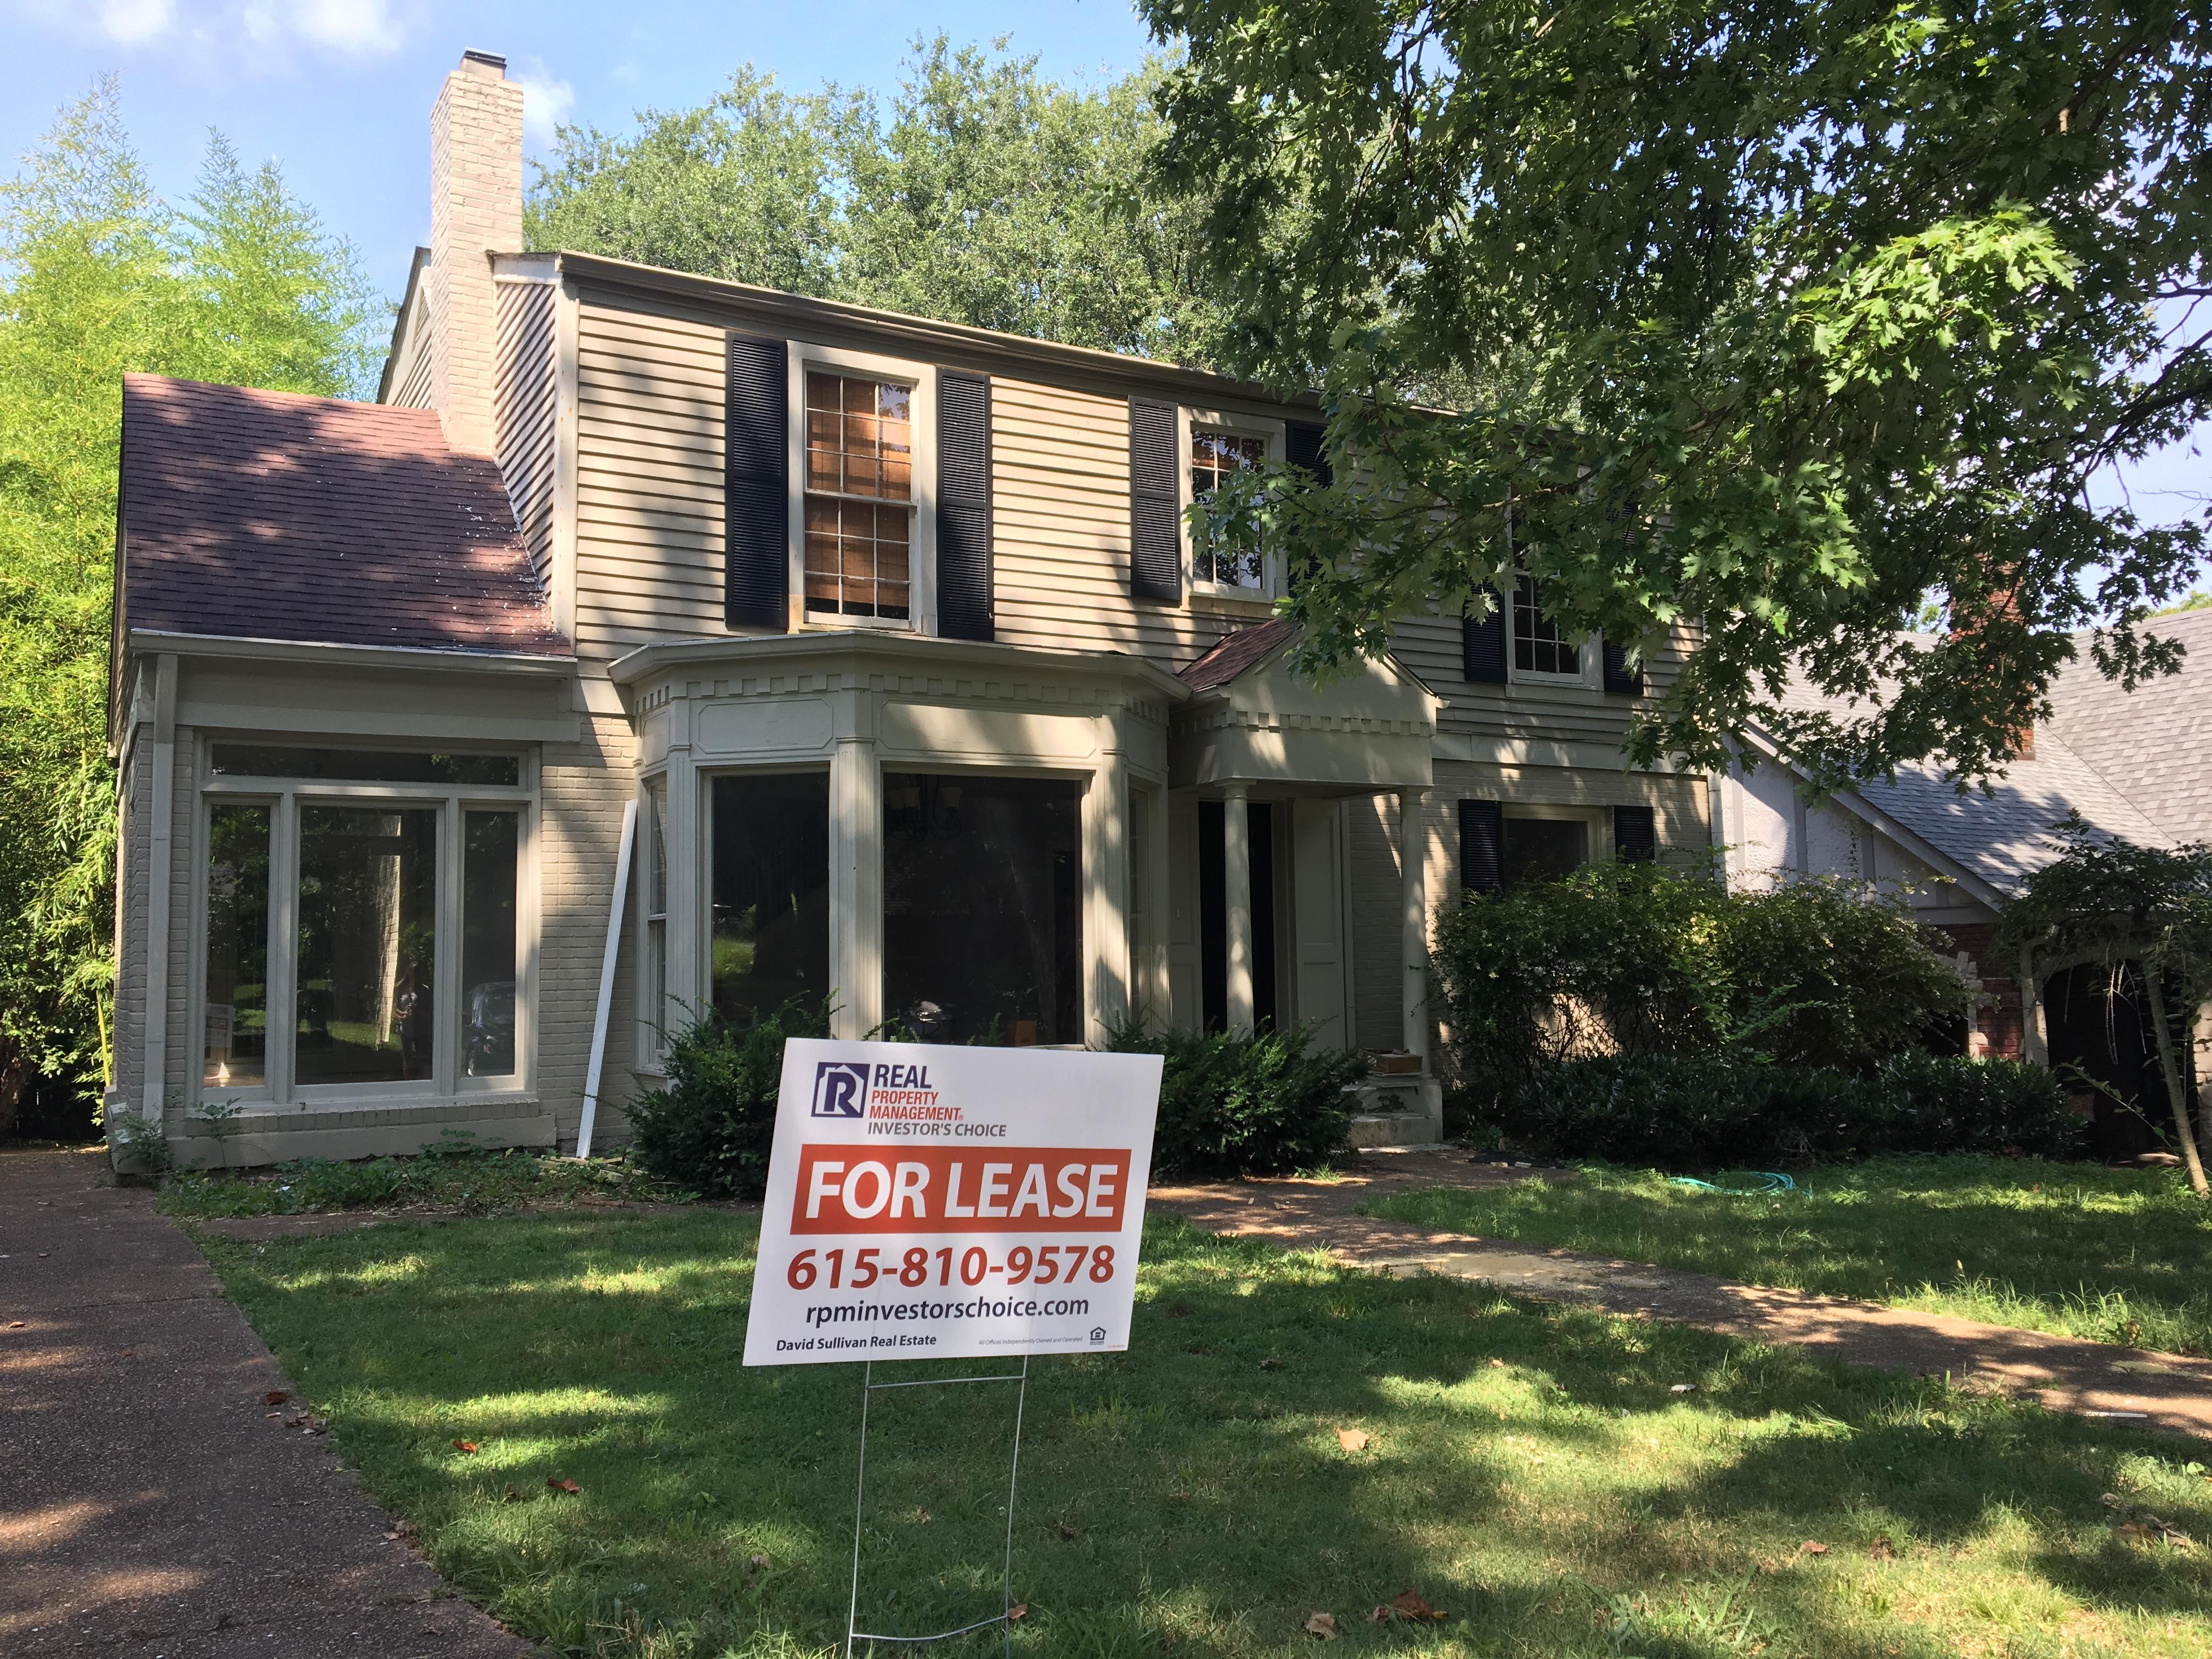 Troy shafer and real property management partner in for Nashville flipped